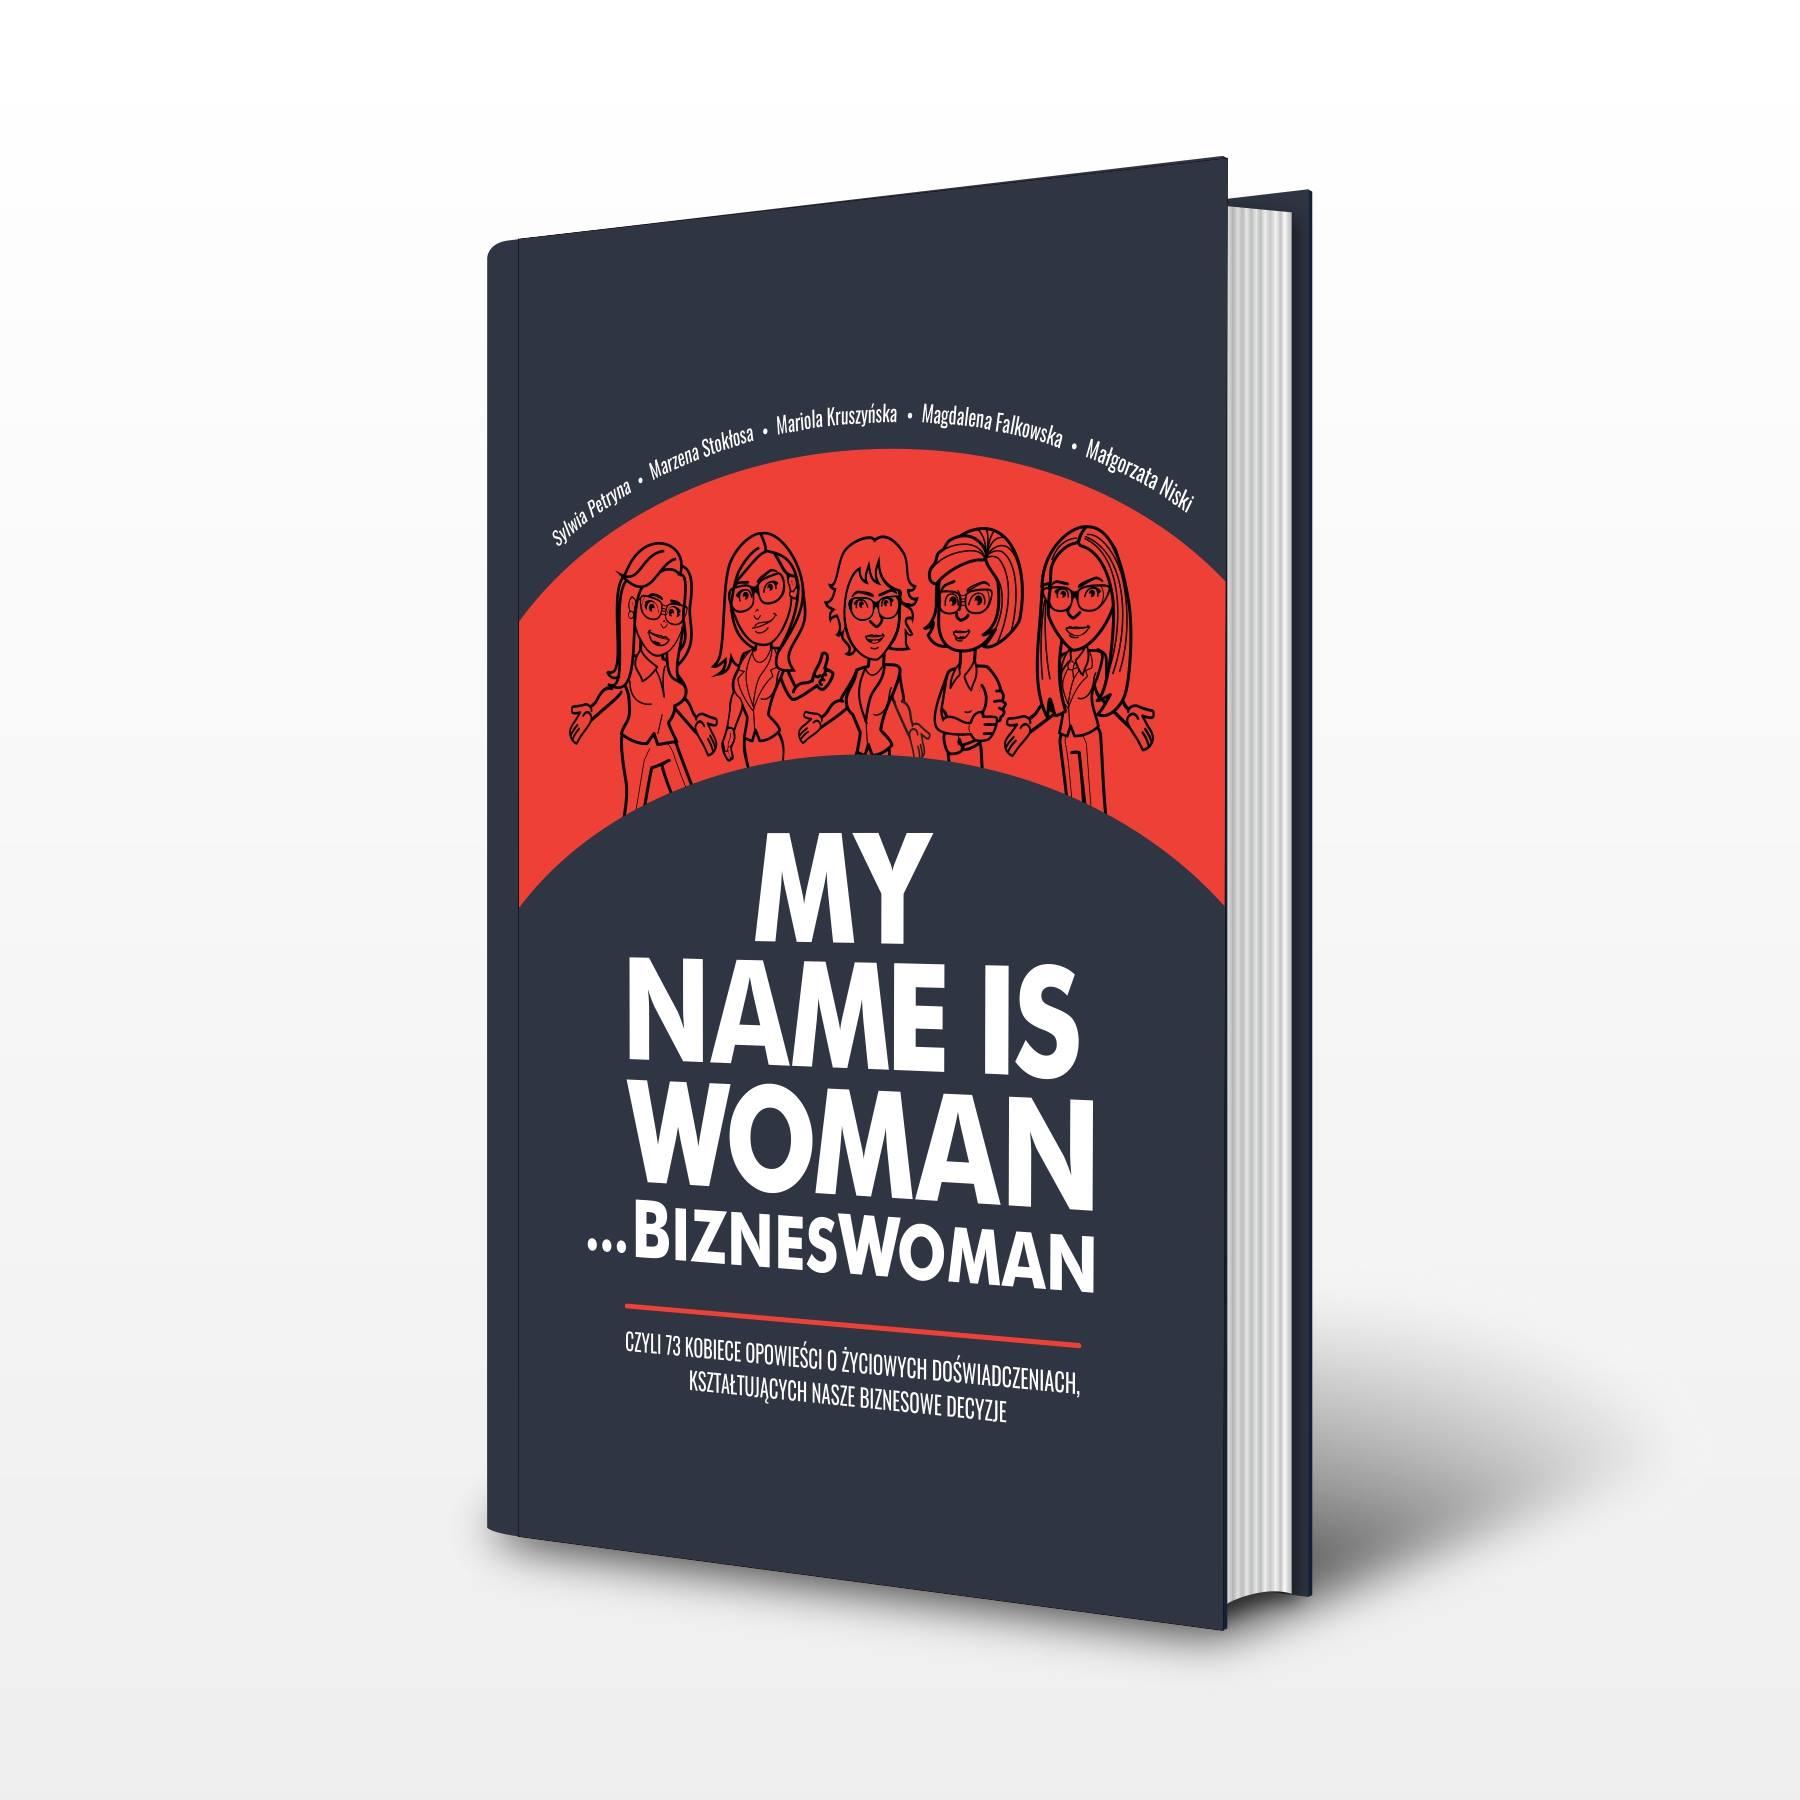 My name is woman... bizneswoman